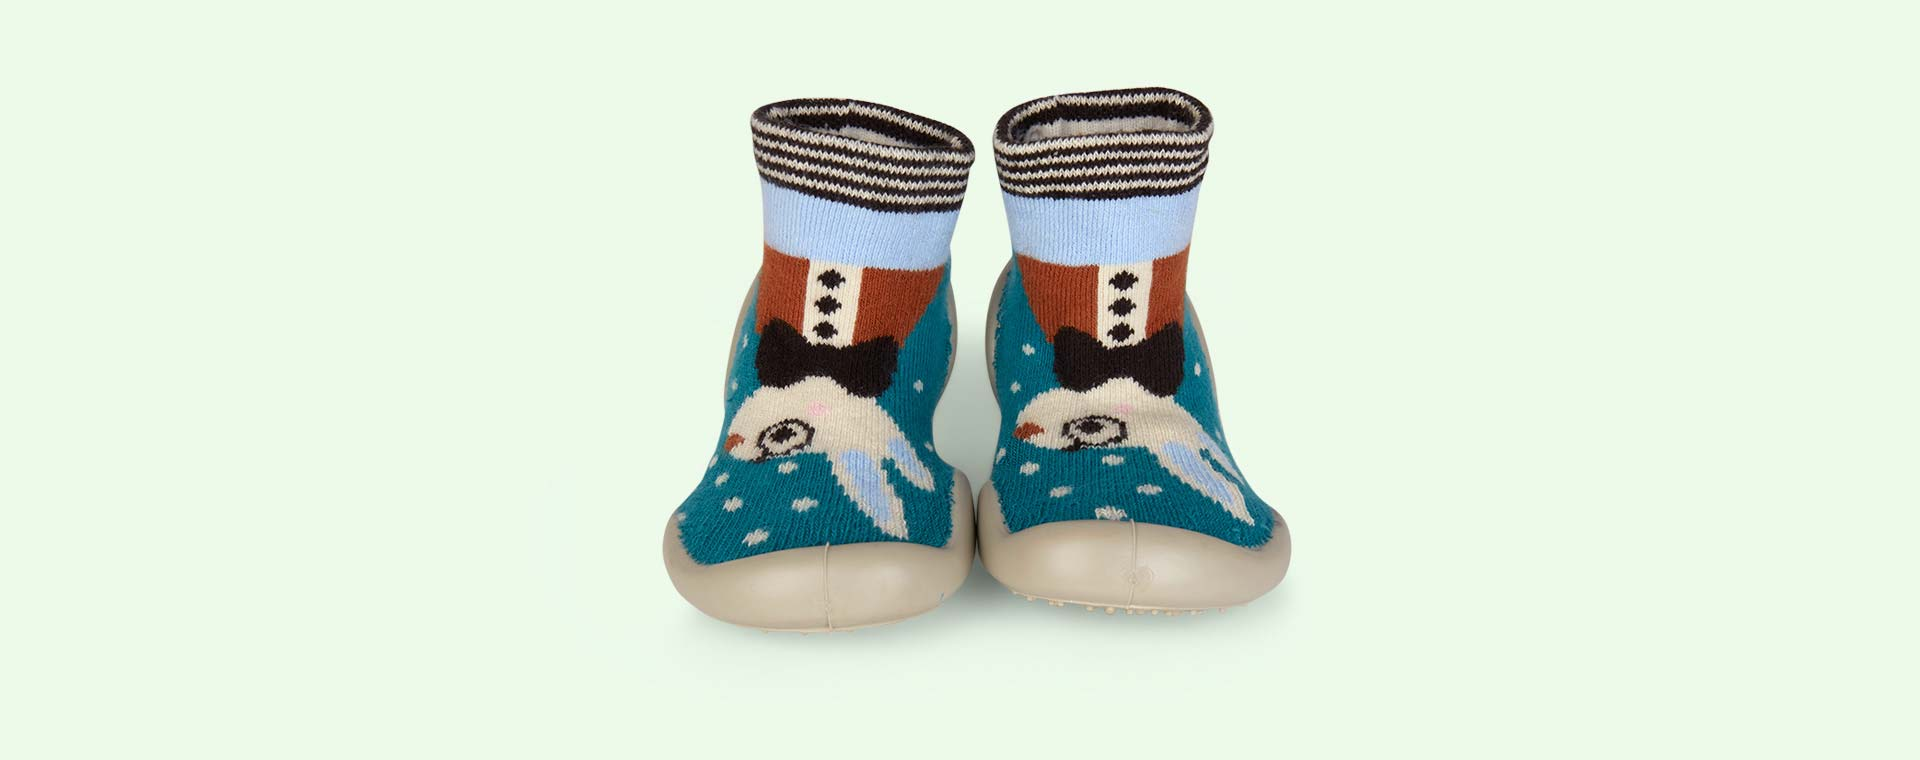 Mr Rabbit Collegien Mr Rabbit Slippers